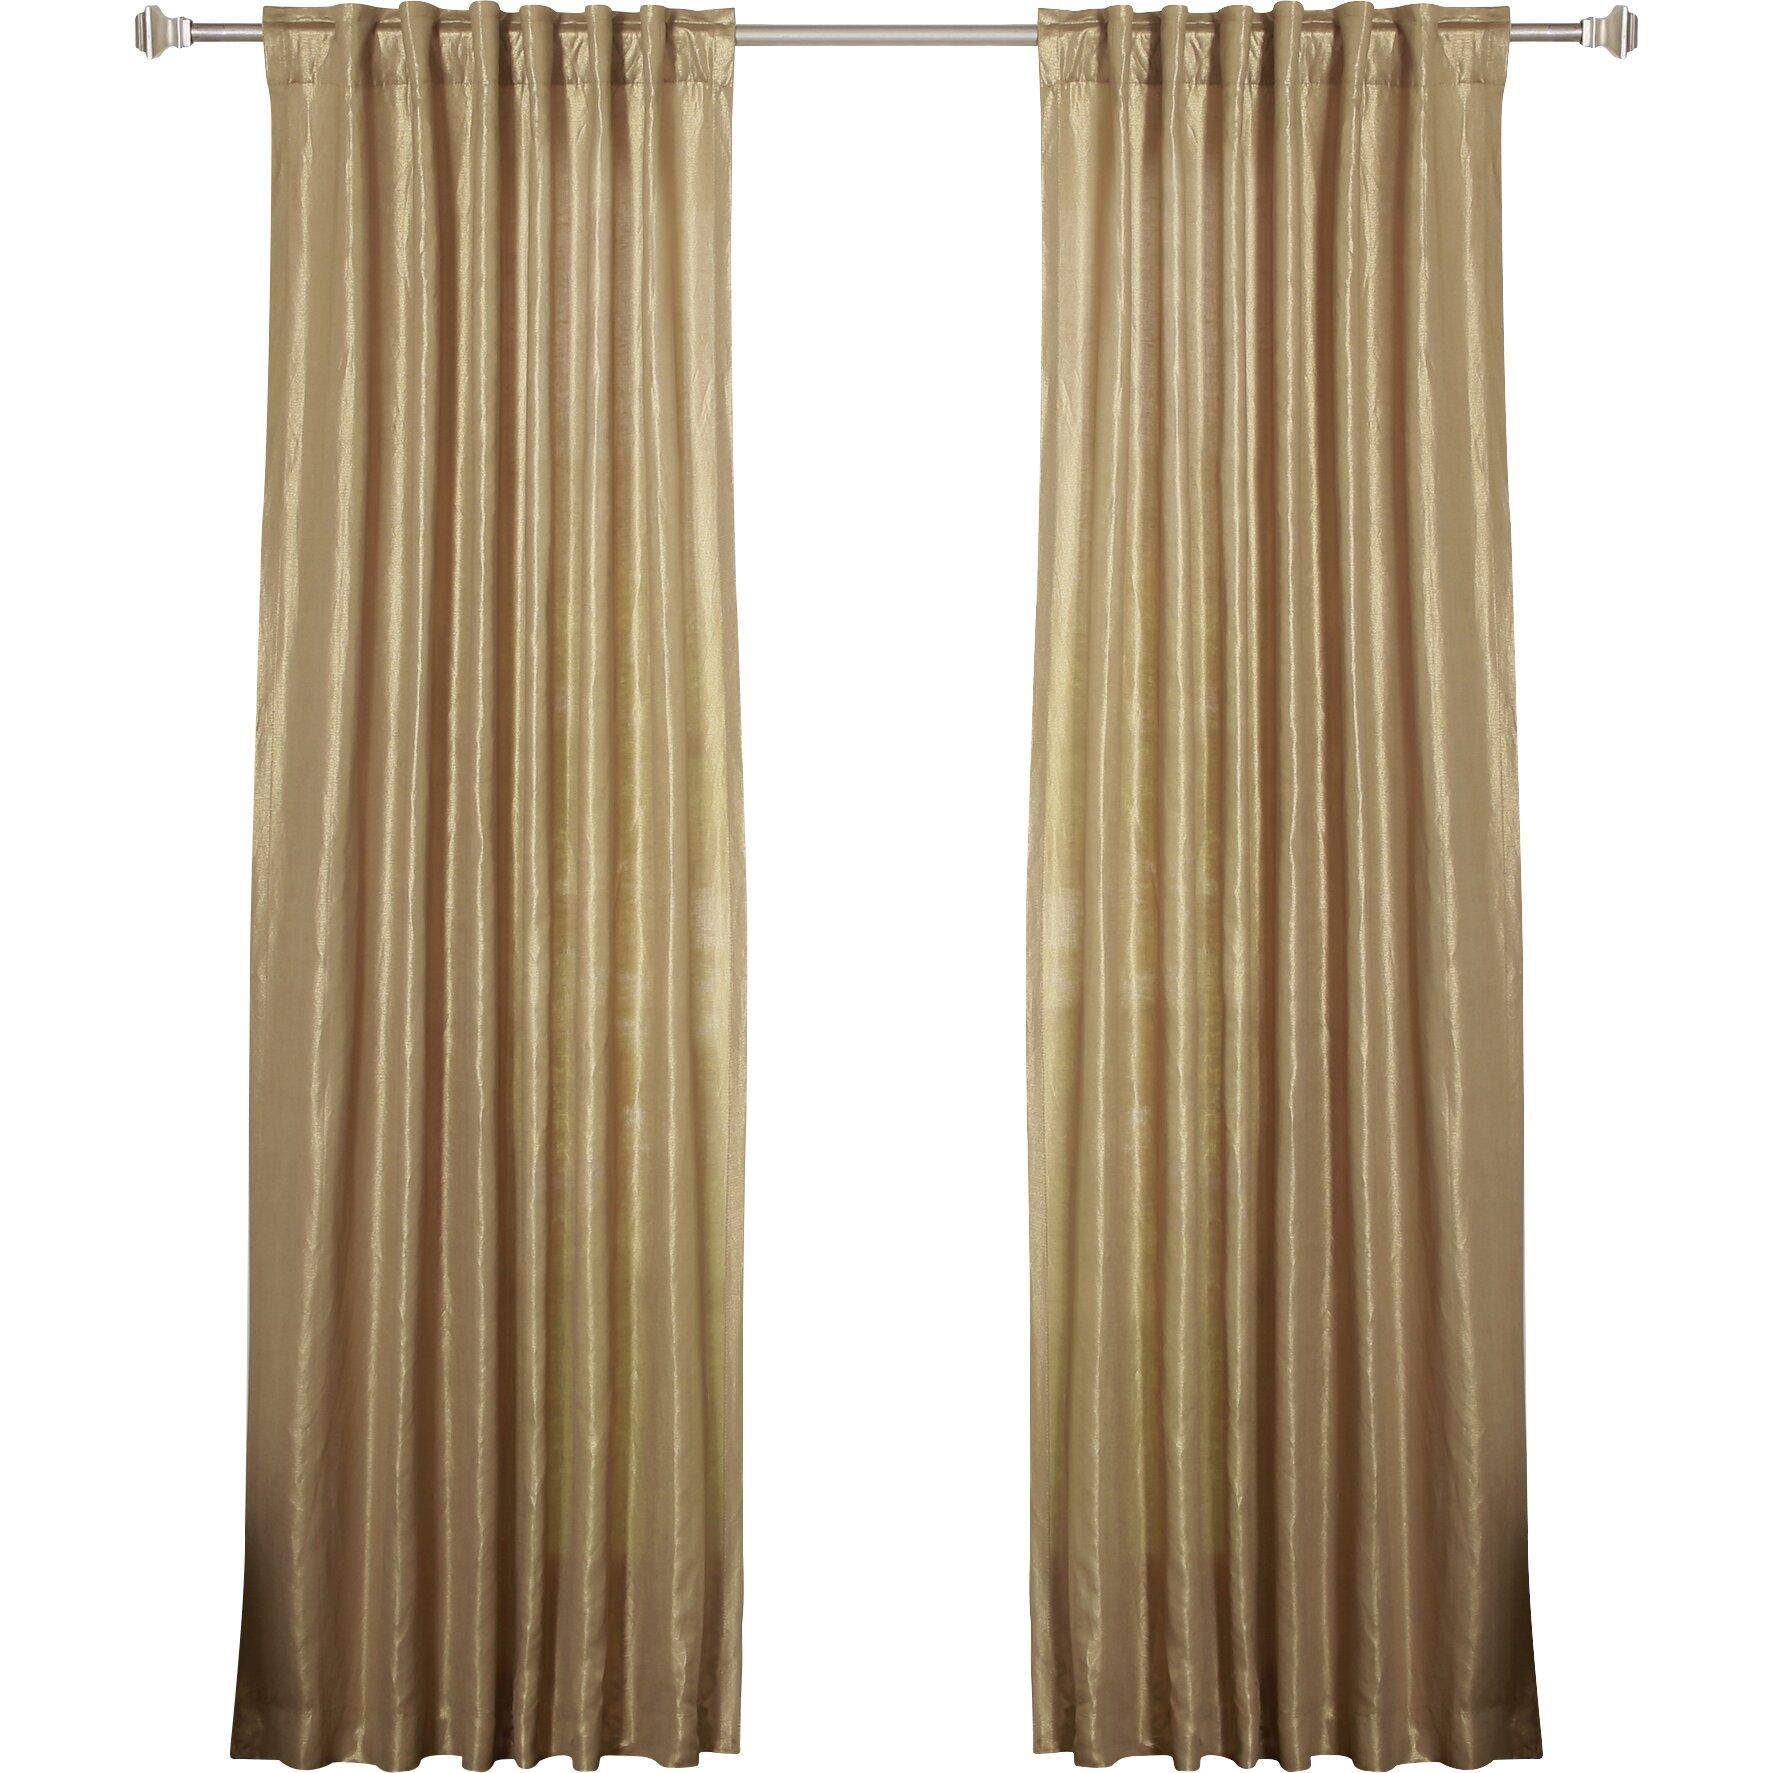 kids room window curtains fenster gardinen muster. Black Bedroom Furniture Sets. Home Design Ideas